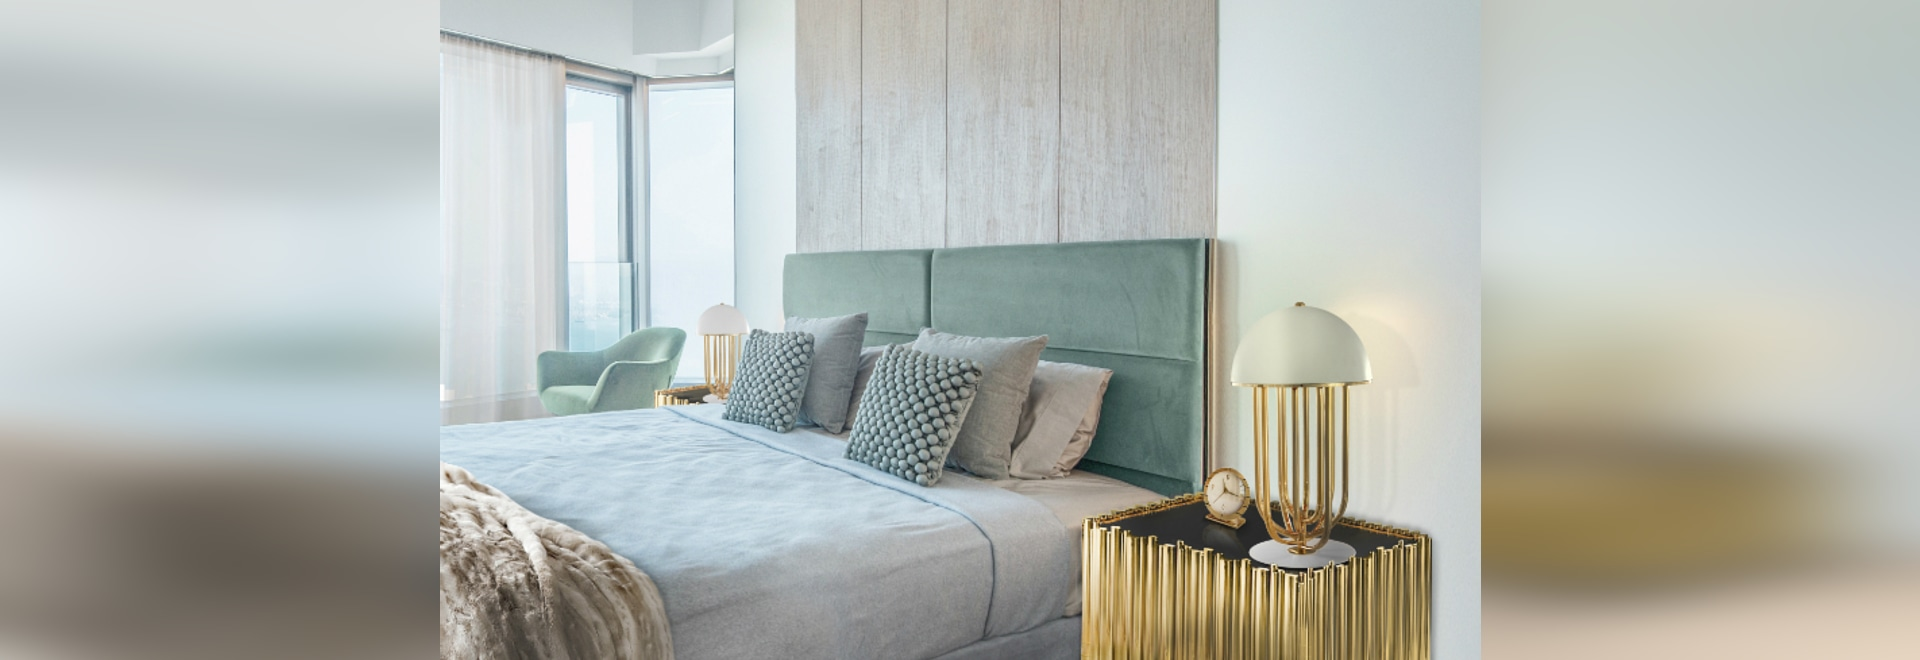 100 Must See Master Bedroom Ideas